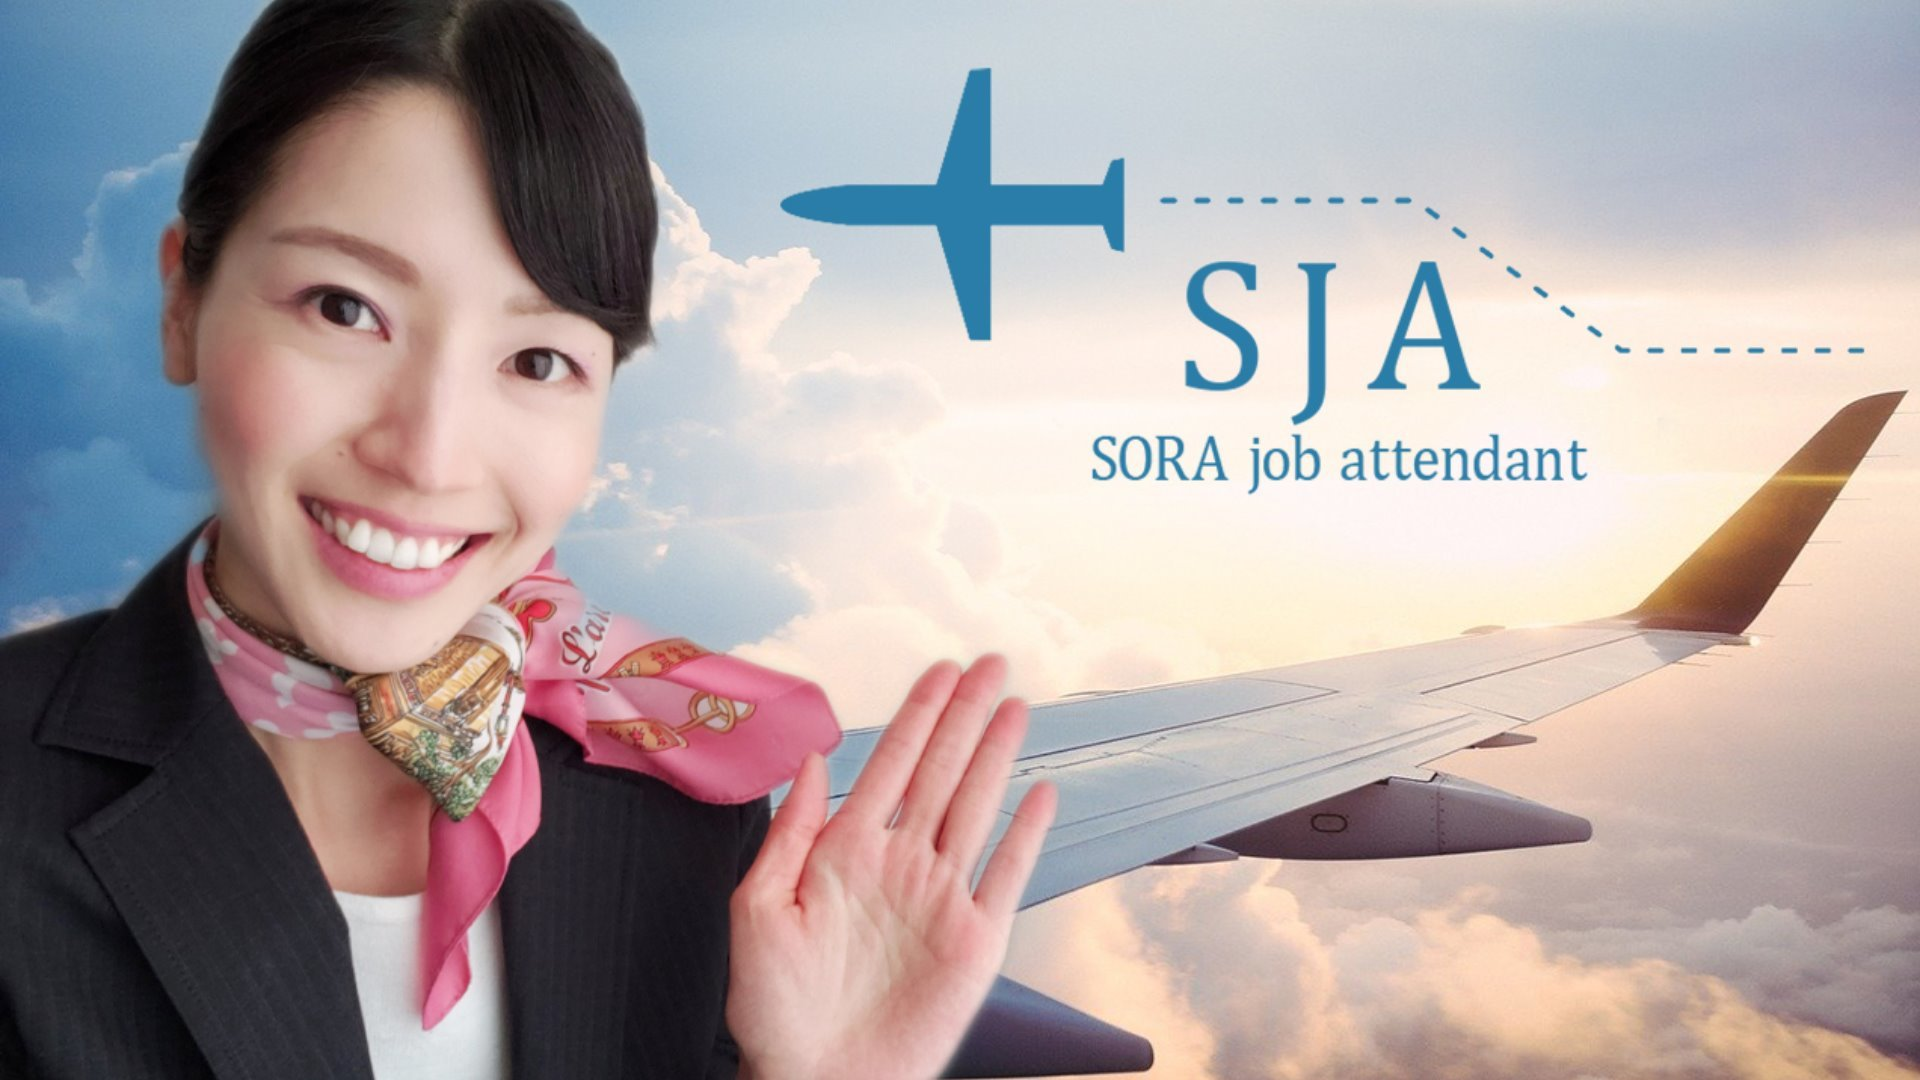 SORA job attendant